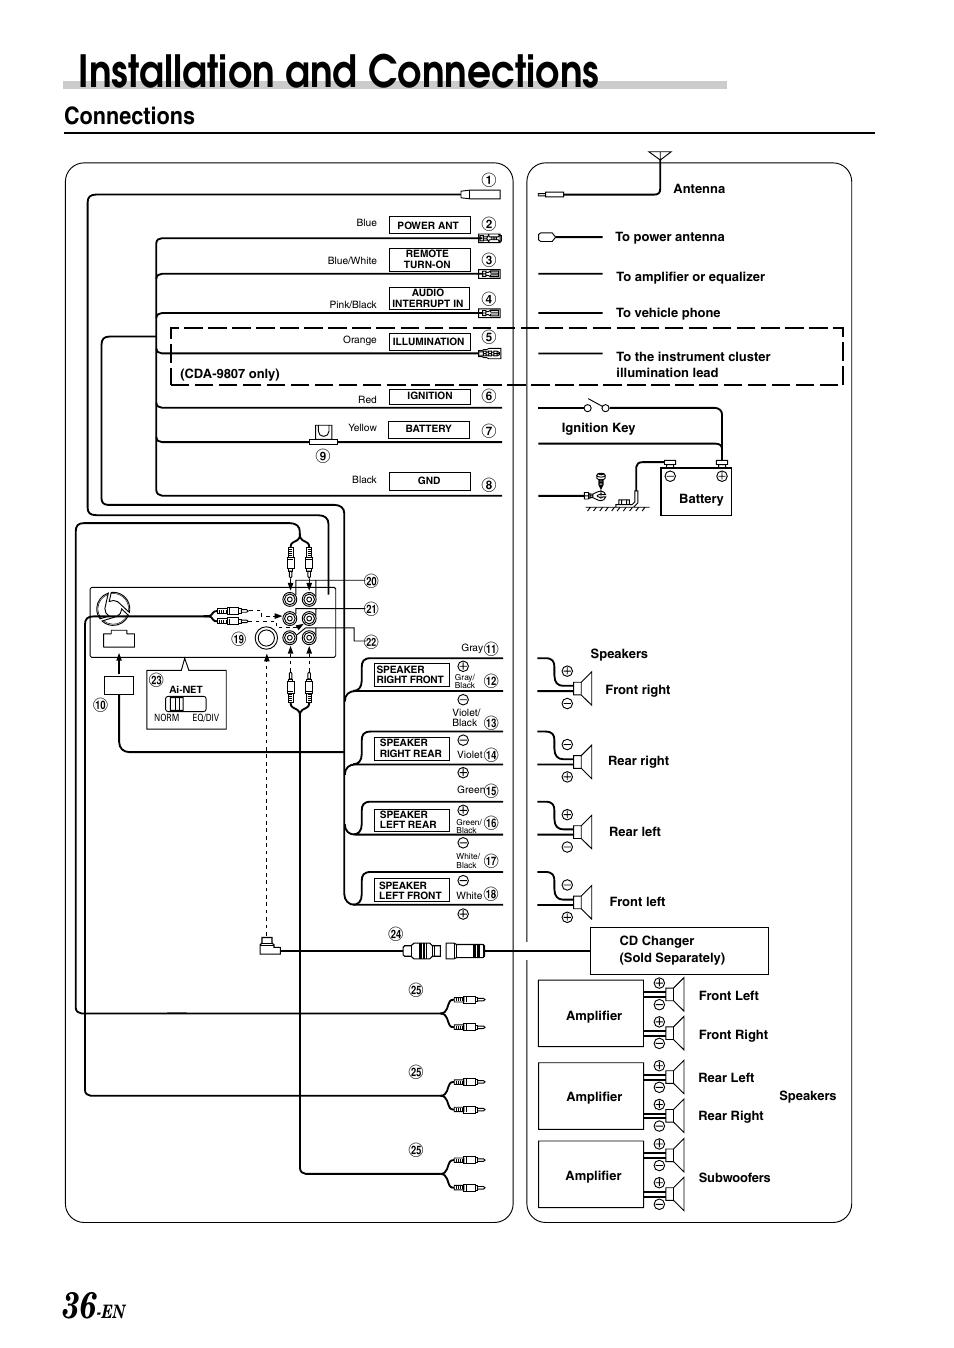 medium resolution of  installation and connections connections alpine cda 9807 on alpine car alarm